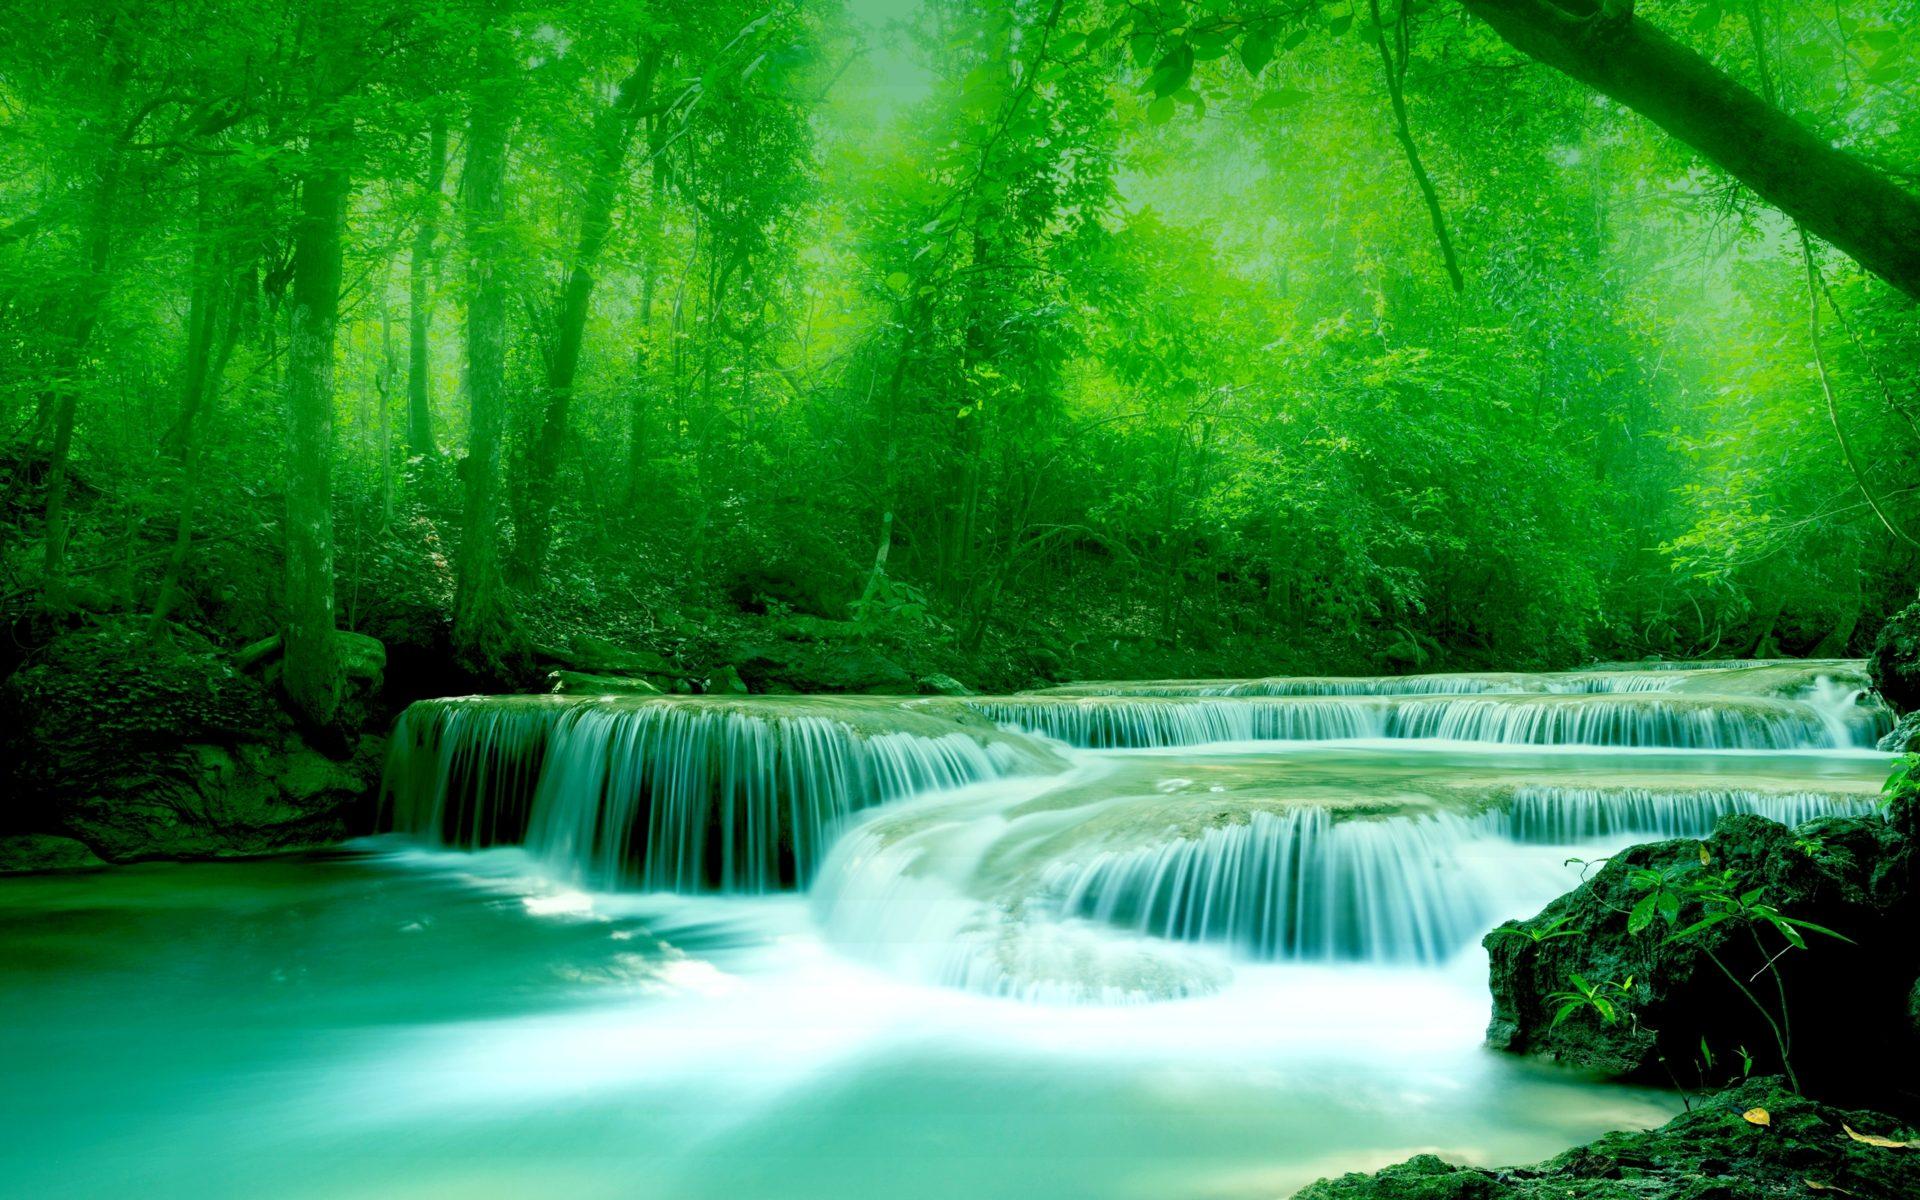 Kuang Si Falls Hd Wallpaper 1920 Wallpaper River Water Rocks Trees Greenery Free